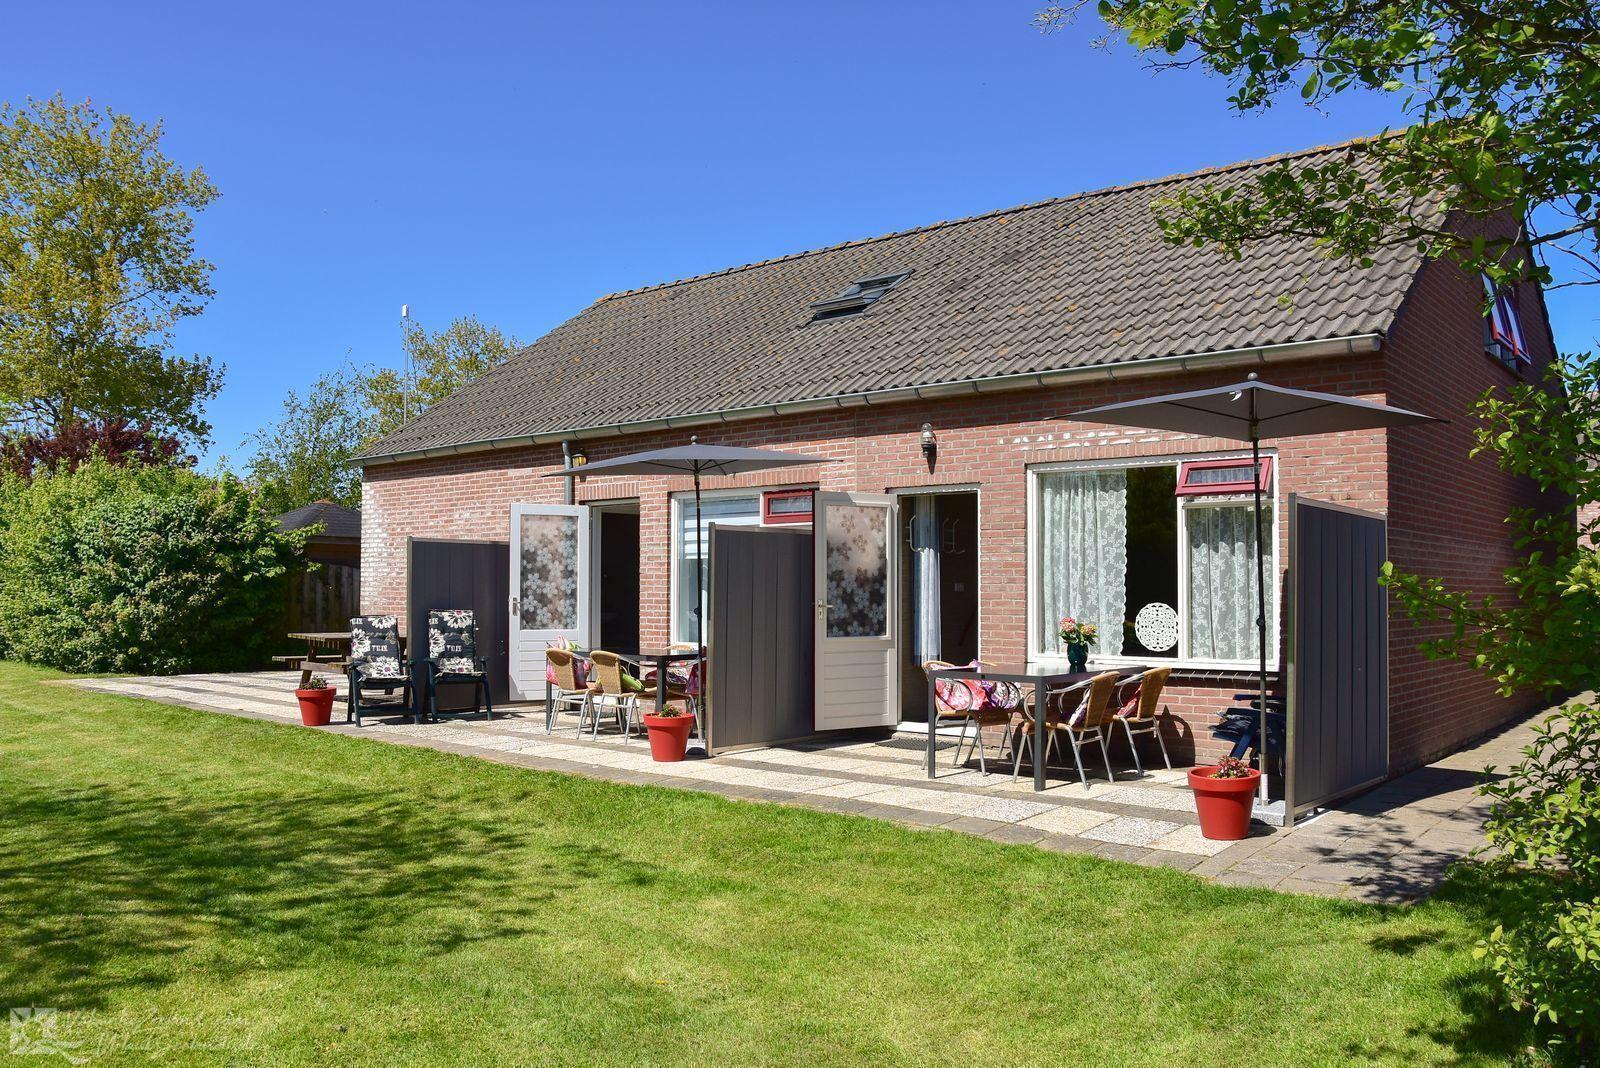 VZ111 Ferienhaus in Zoutelande